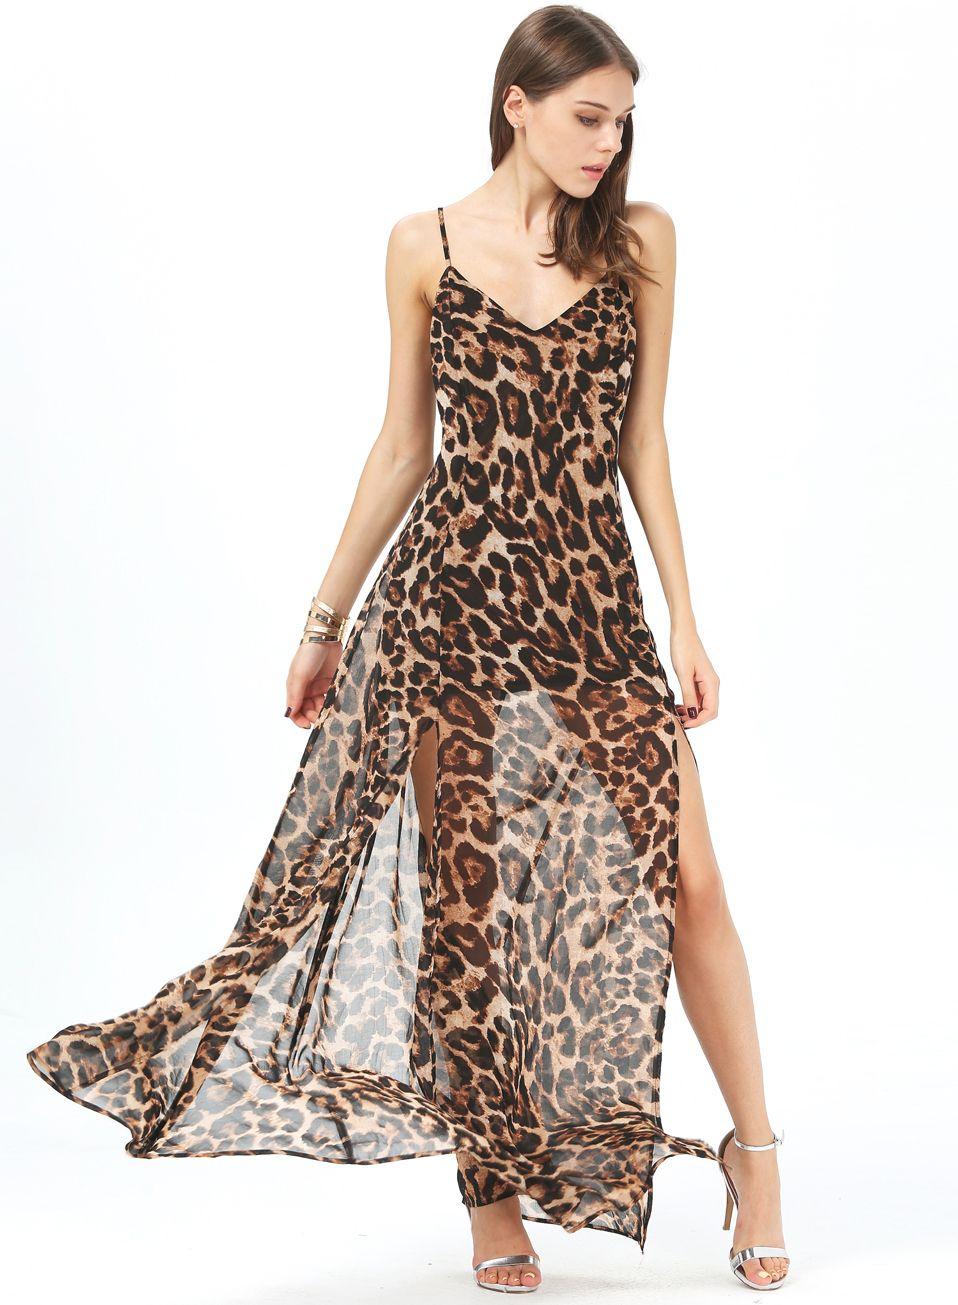 Leopard Print Spaghetti Strap Chiffon Maxi Dress - Sheinside.com ...